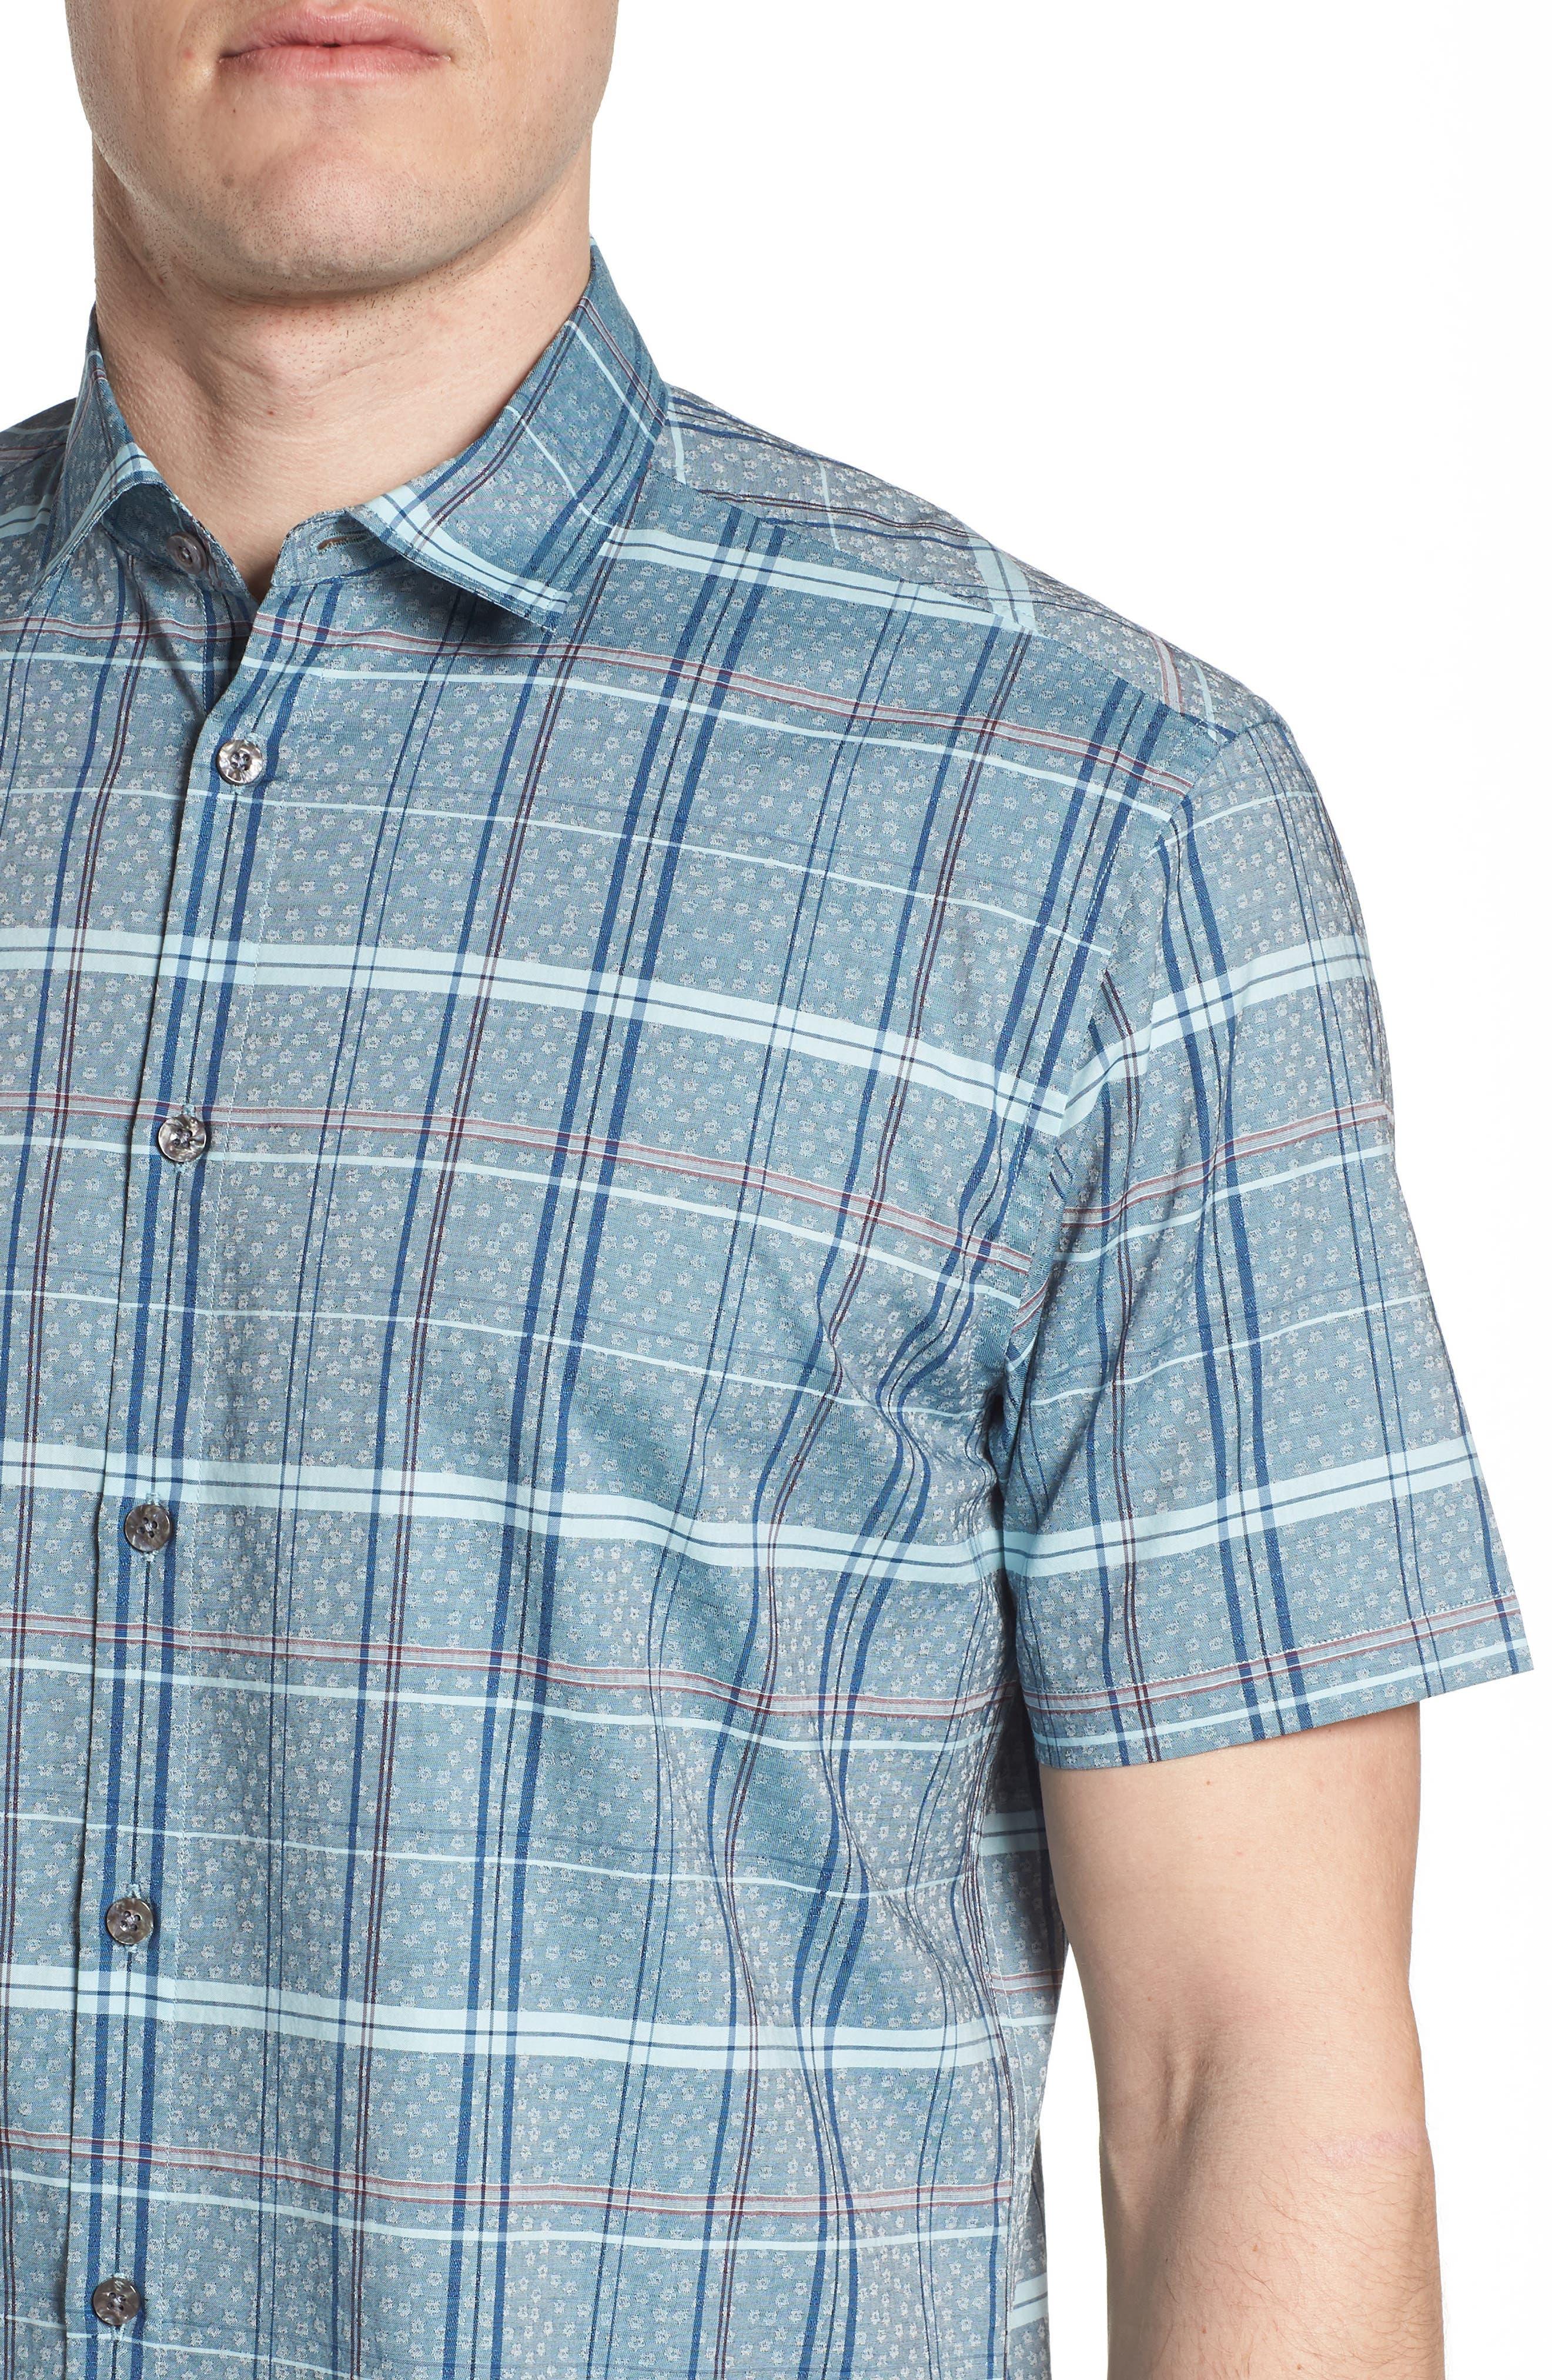 Vacaso Regular Fit Plaid Jacquard Sport Shirt,                             Alternate thumbnail 2, color,                             Water